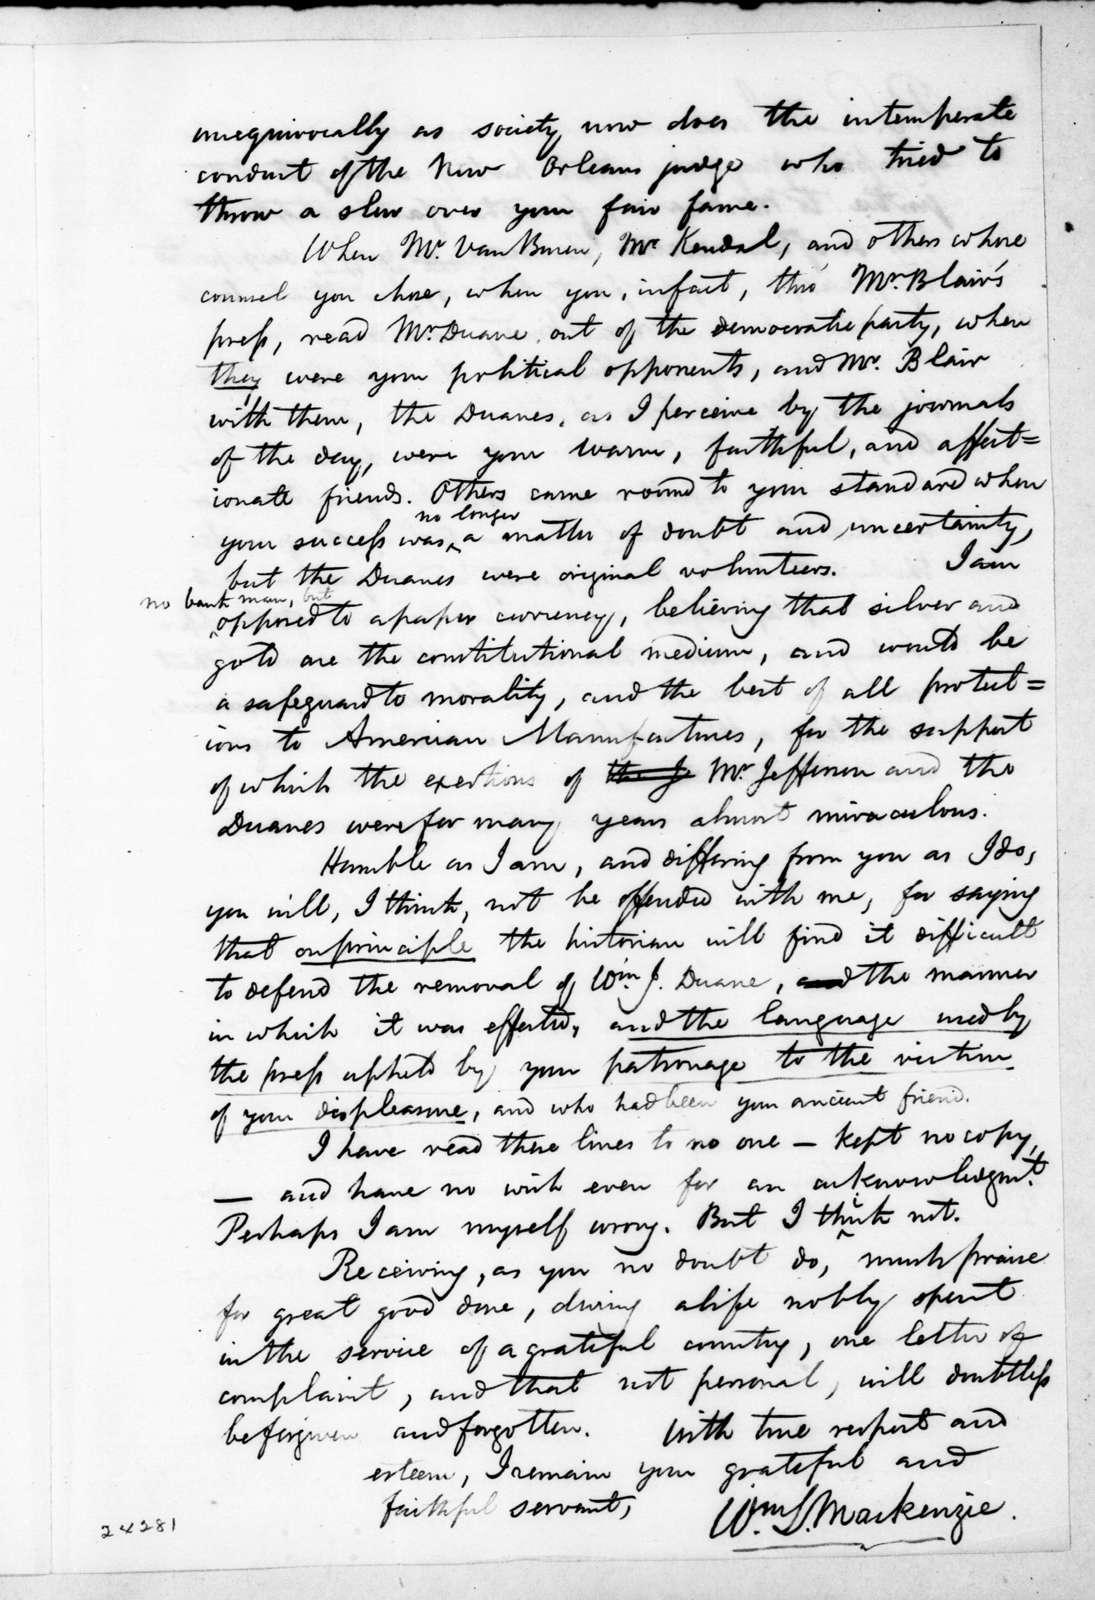 William Lyon Mackenzie to Andrew Jackson, February 21, 1844